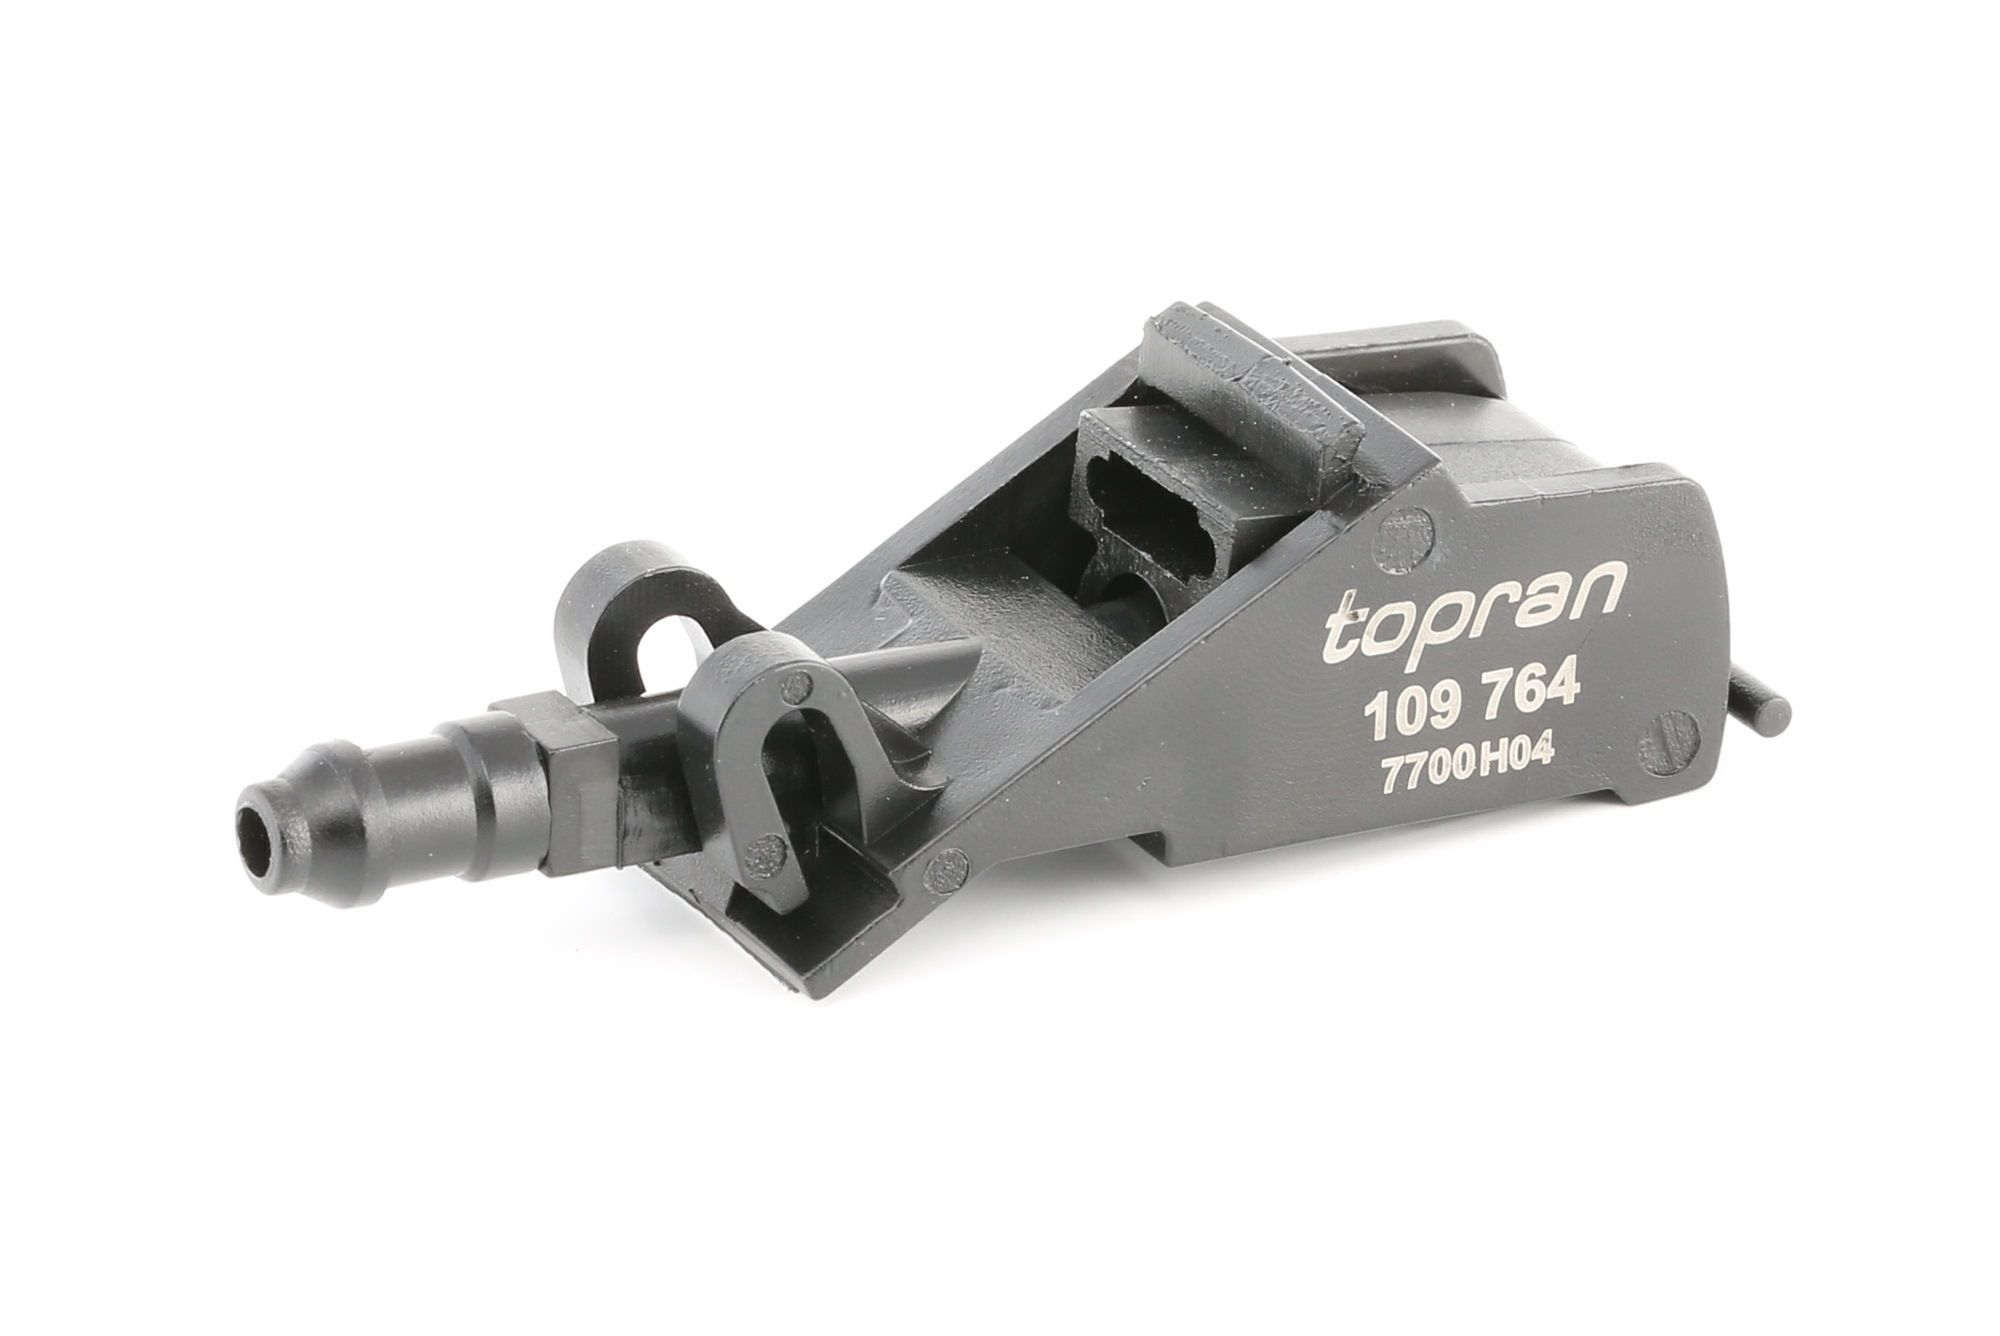 TOPRAN: Original Waschdüsen 109 764 ()